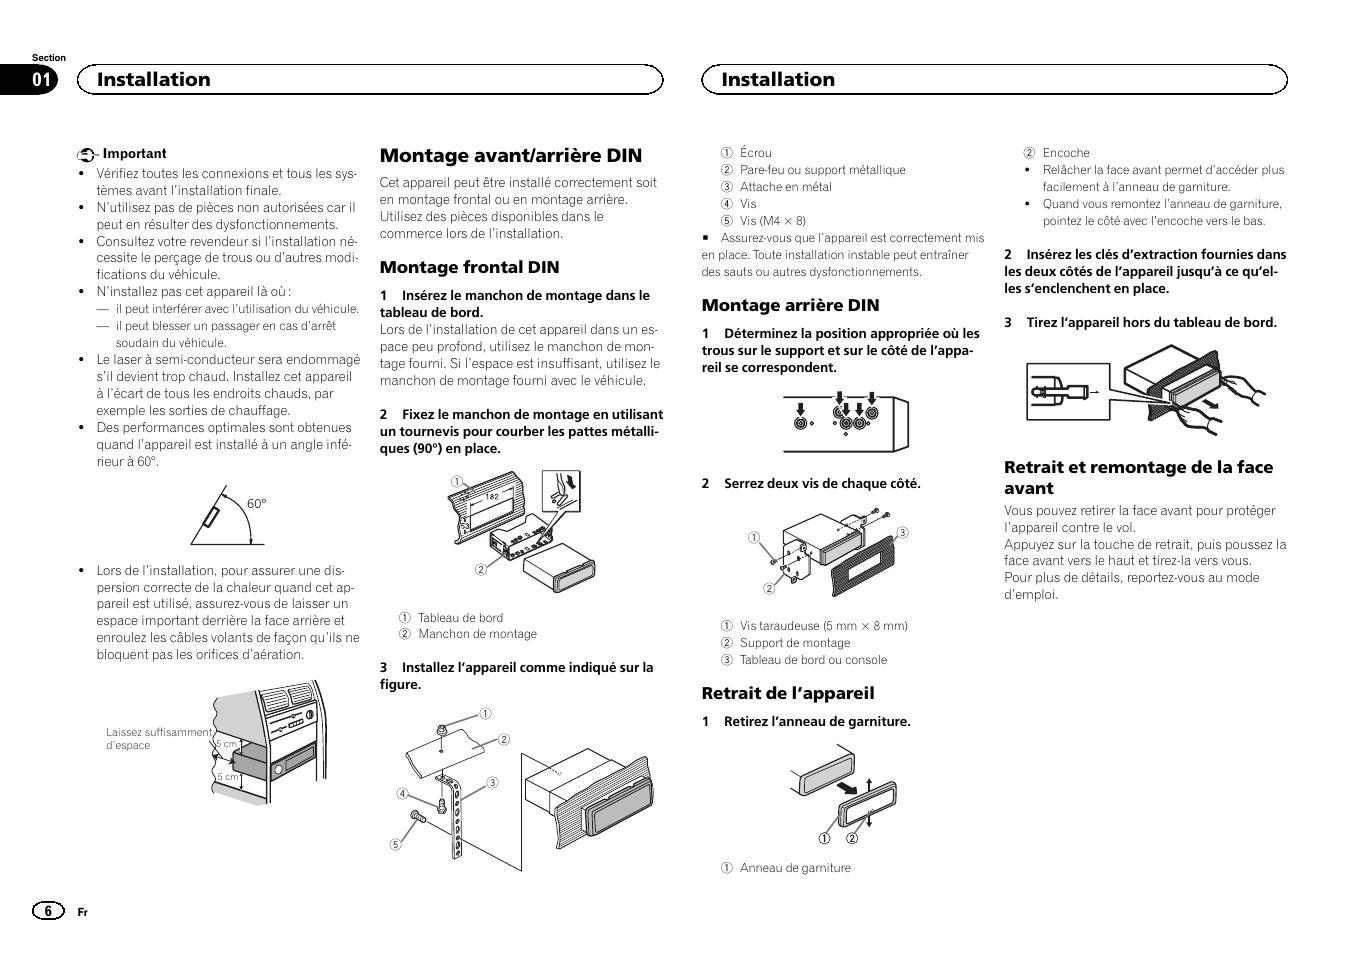 fran ais montage avant arri re din installation pioneer deh rh manualsdir com pioneer deh-4400bt installation manual pioneer deh 4400bt user manual